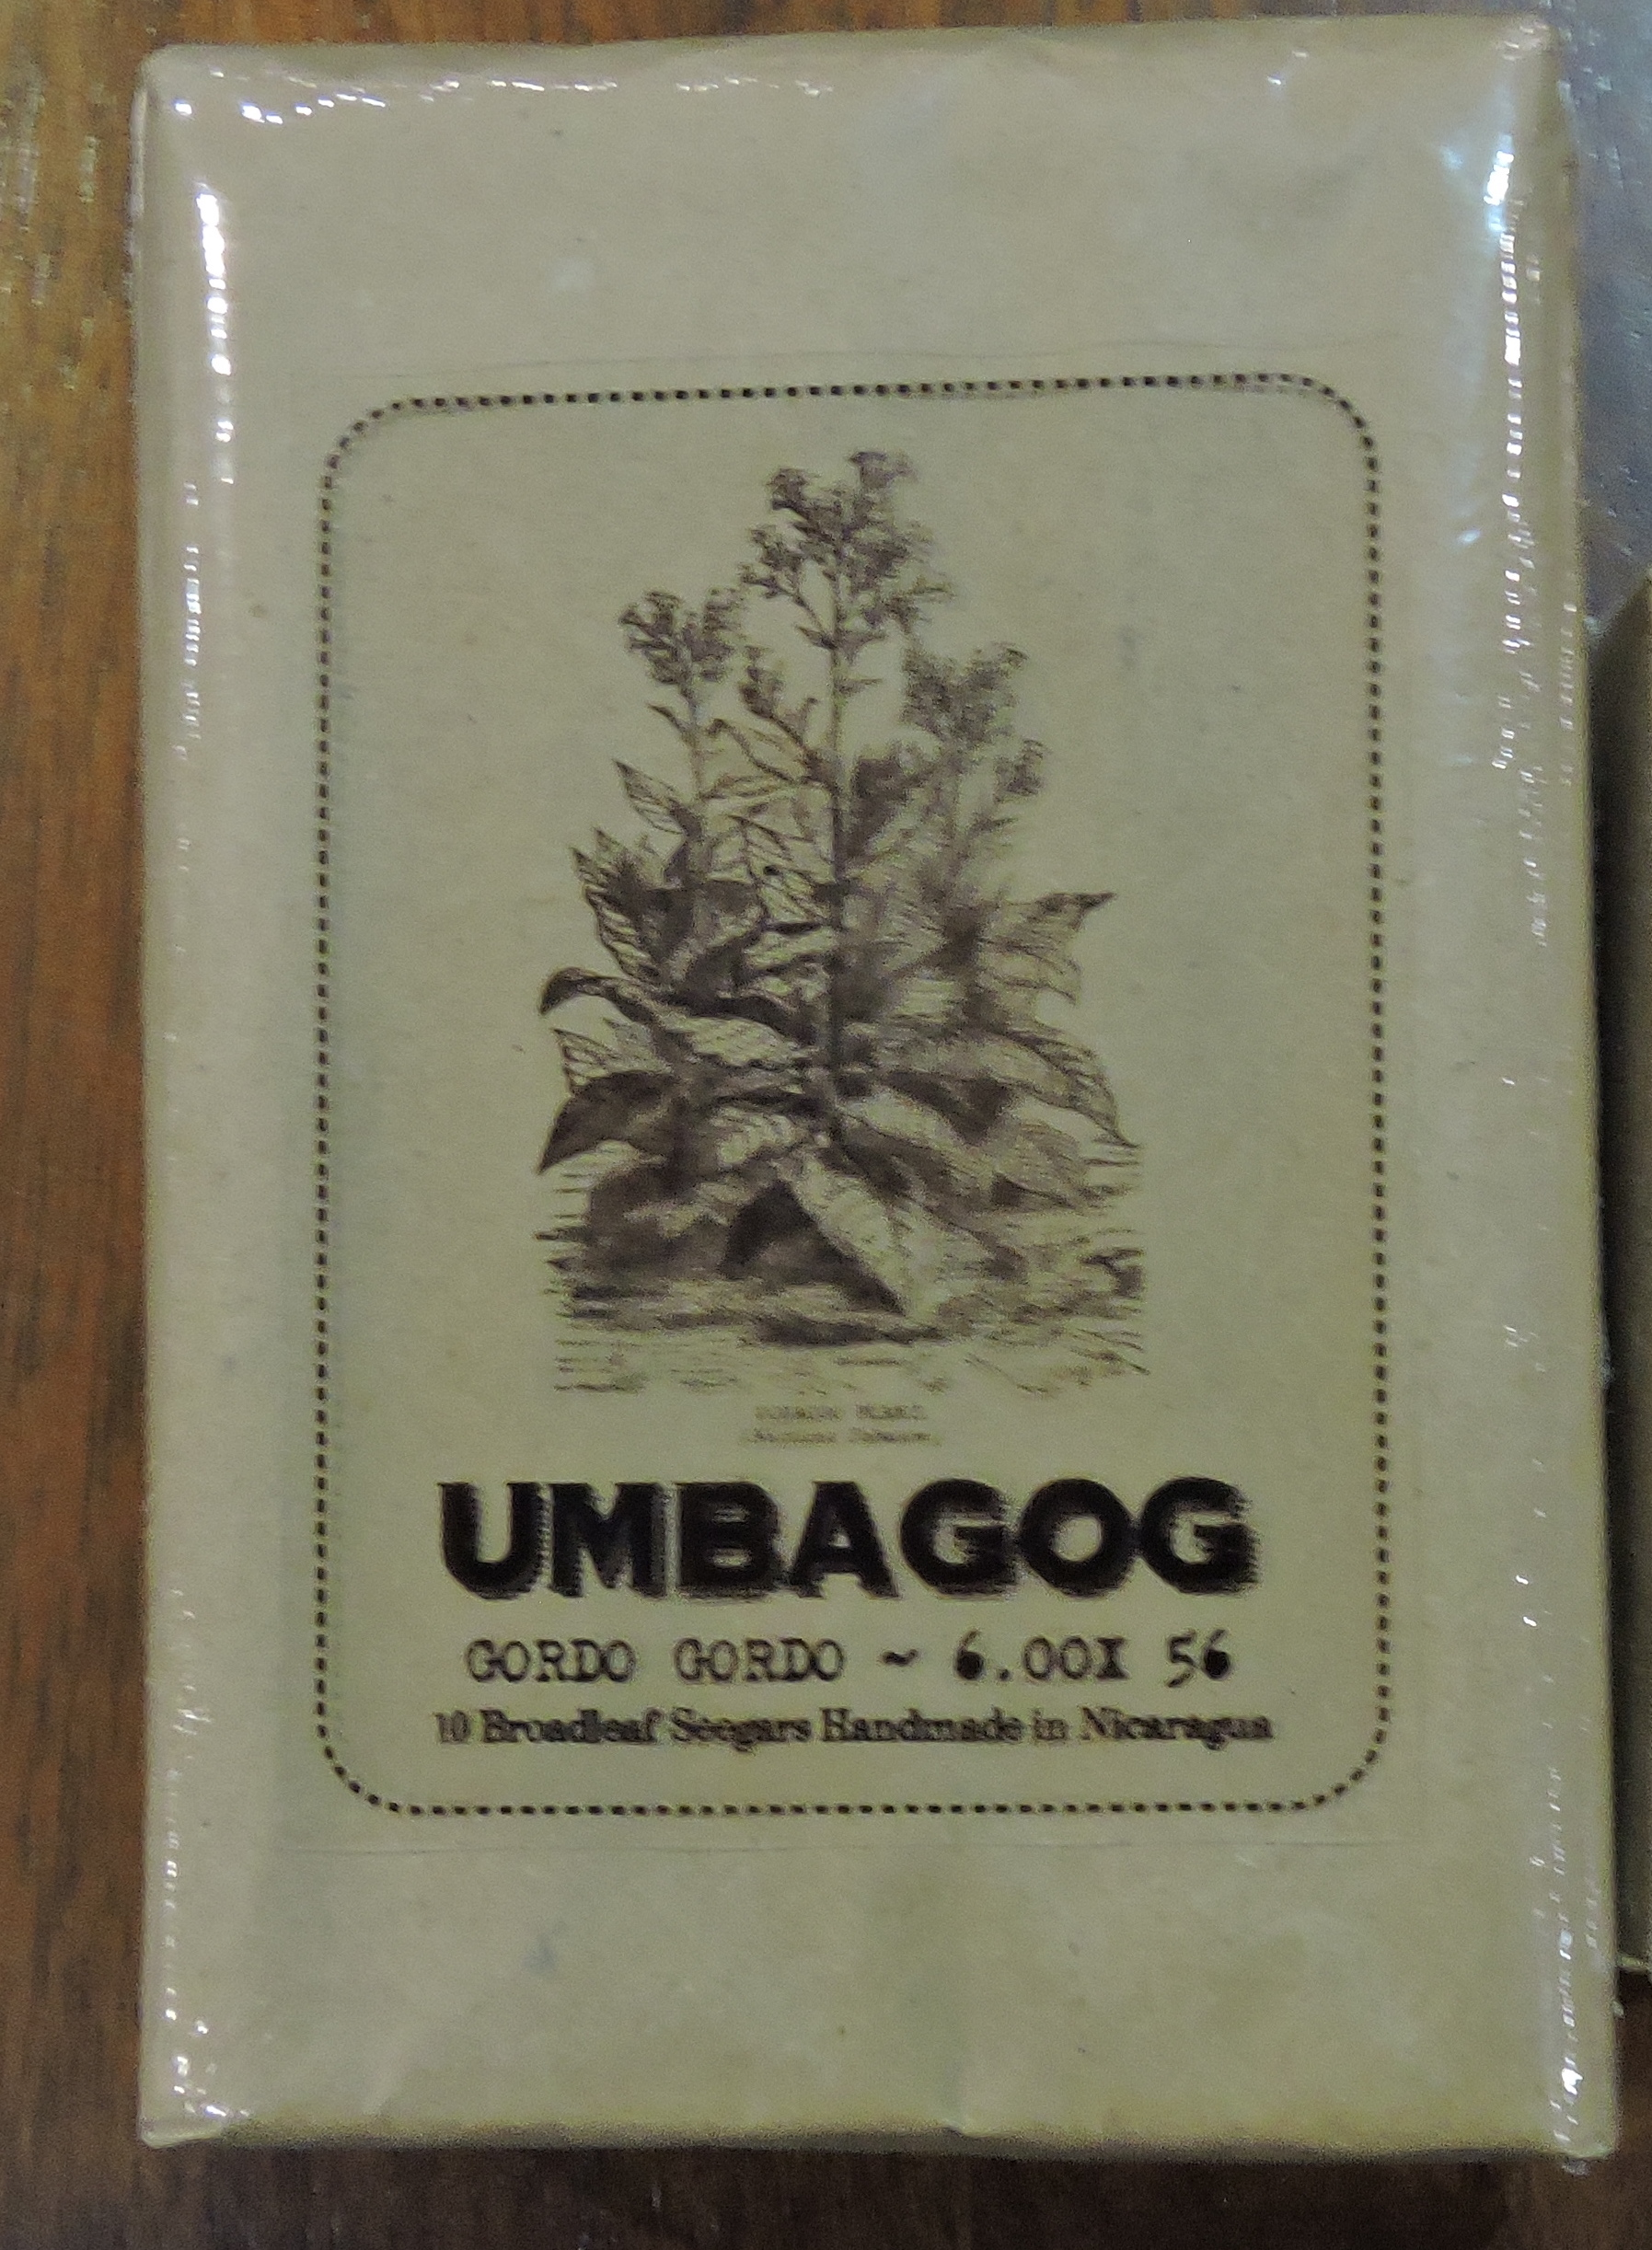 Dunbarton_Tobacco_and_Trust_Umbagog_